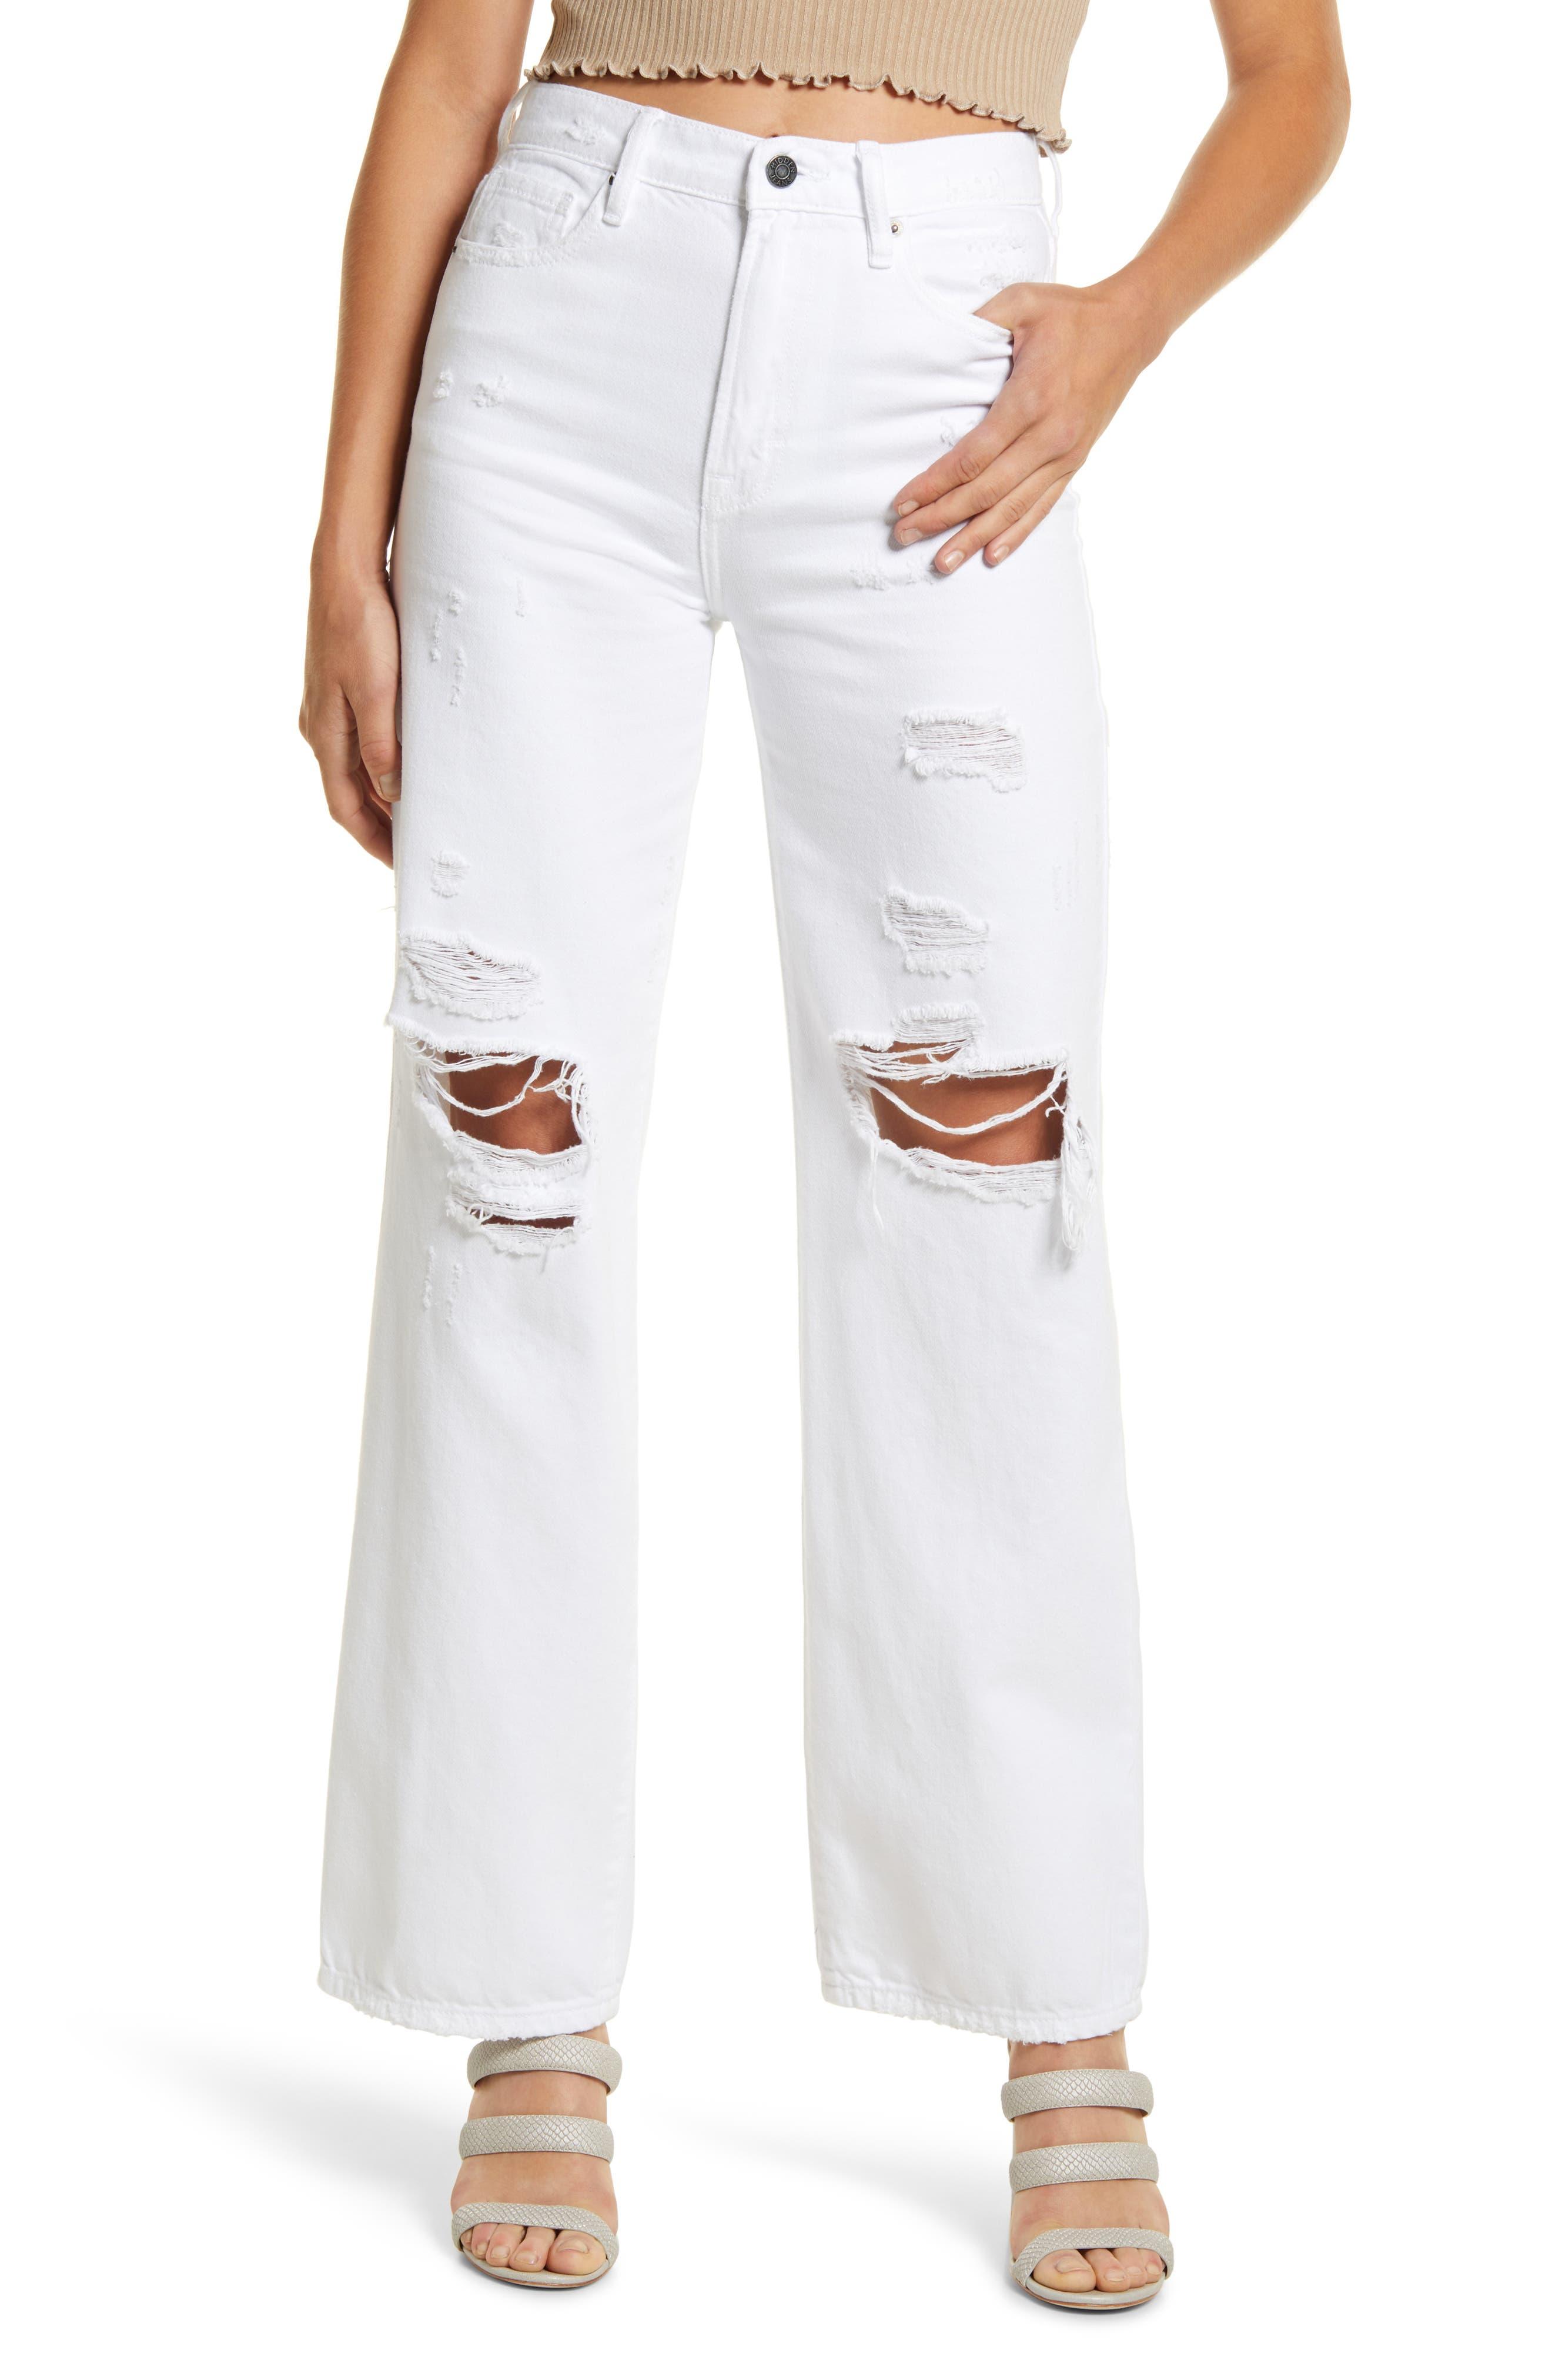 Distressed High Waist Wide Leg Jeans